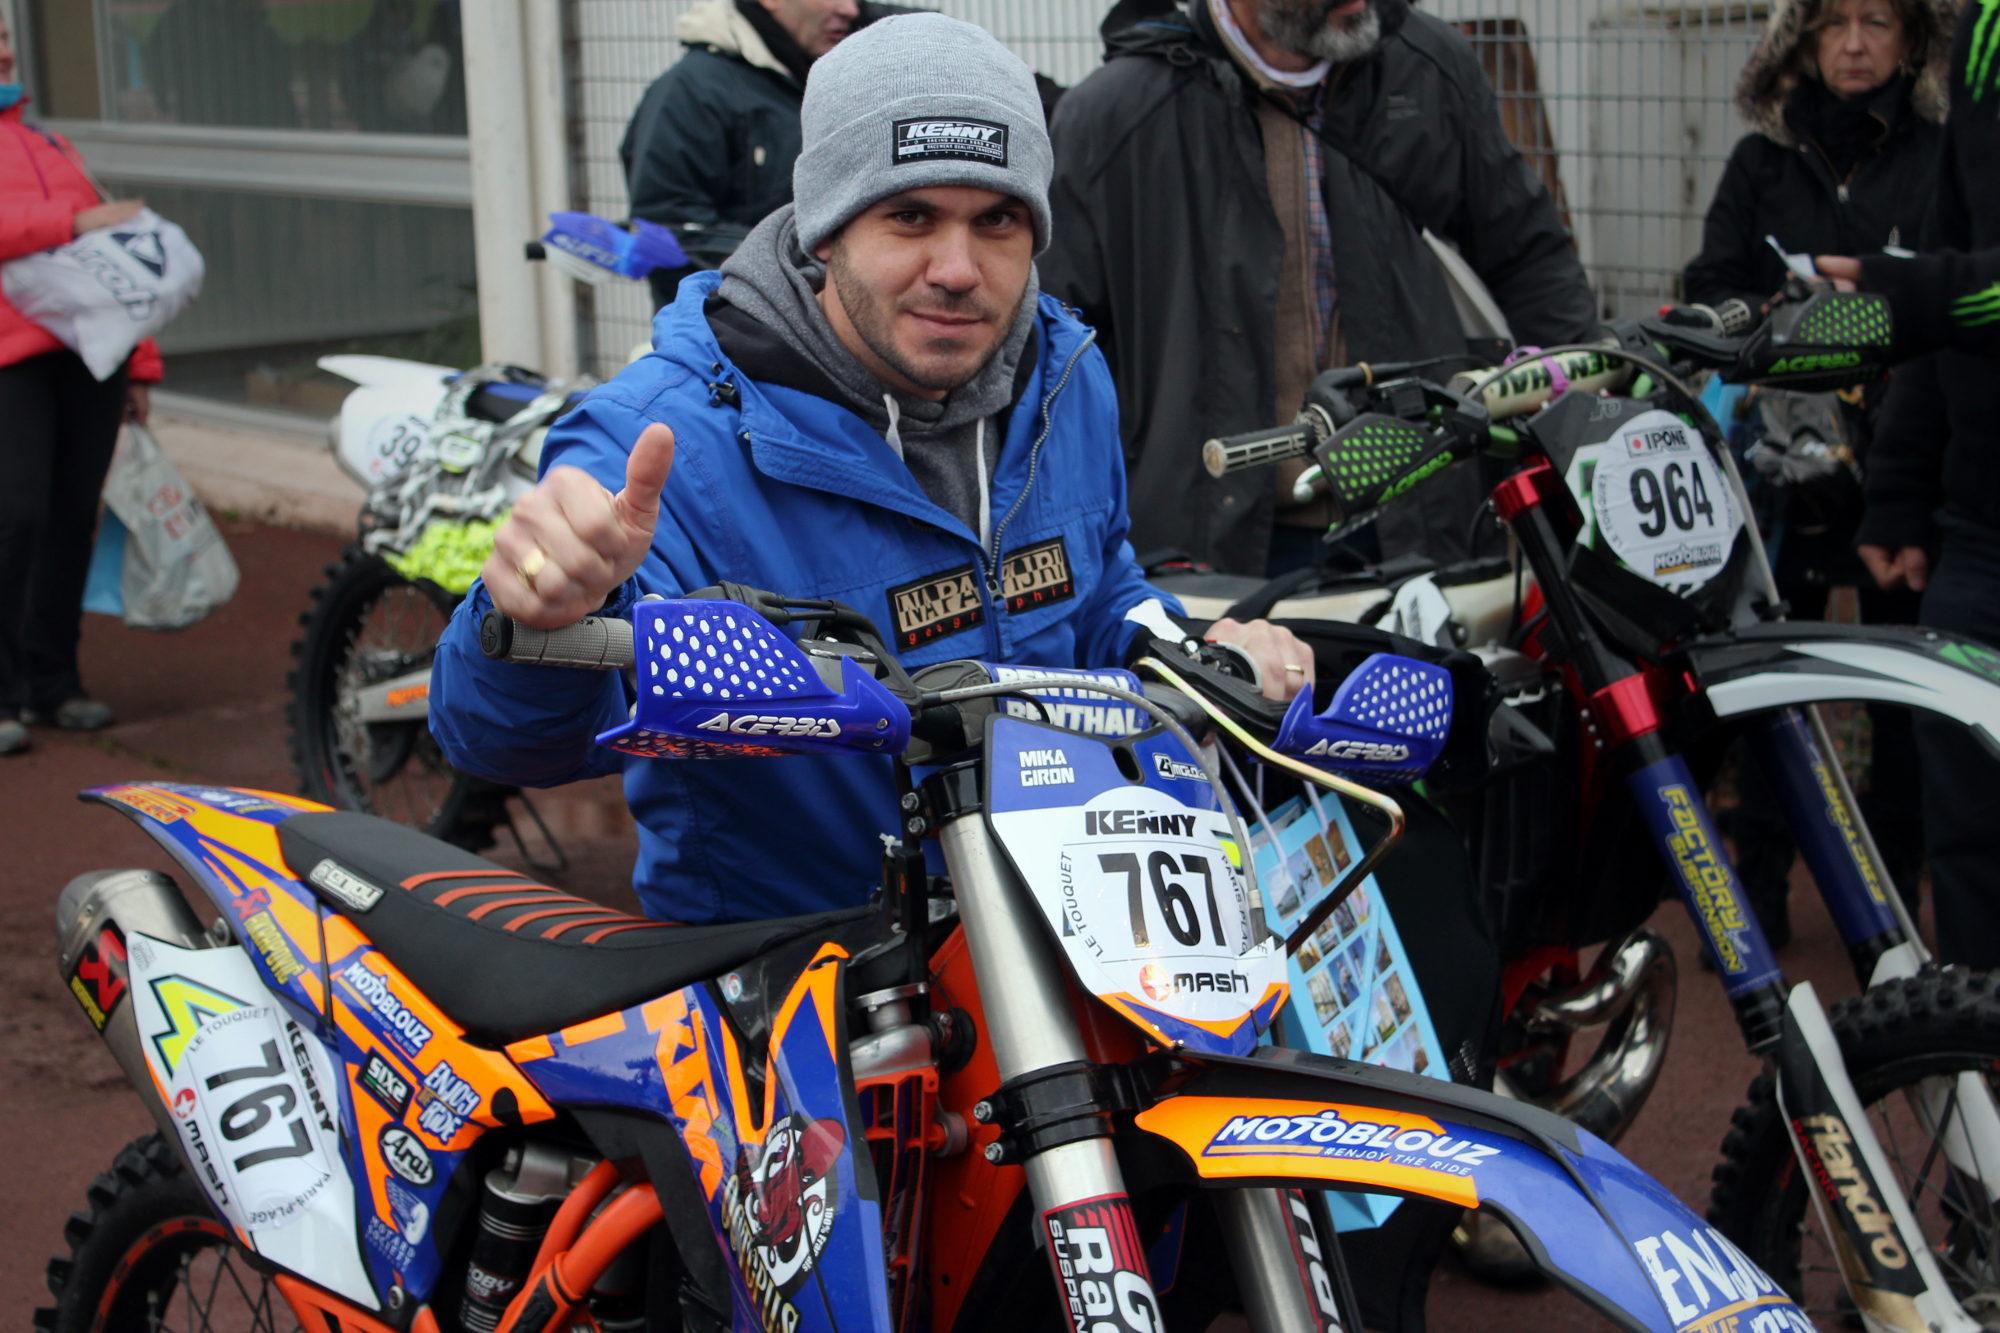 Mika Giron à l'Enduropale 2019